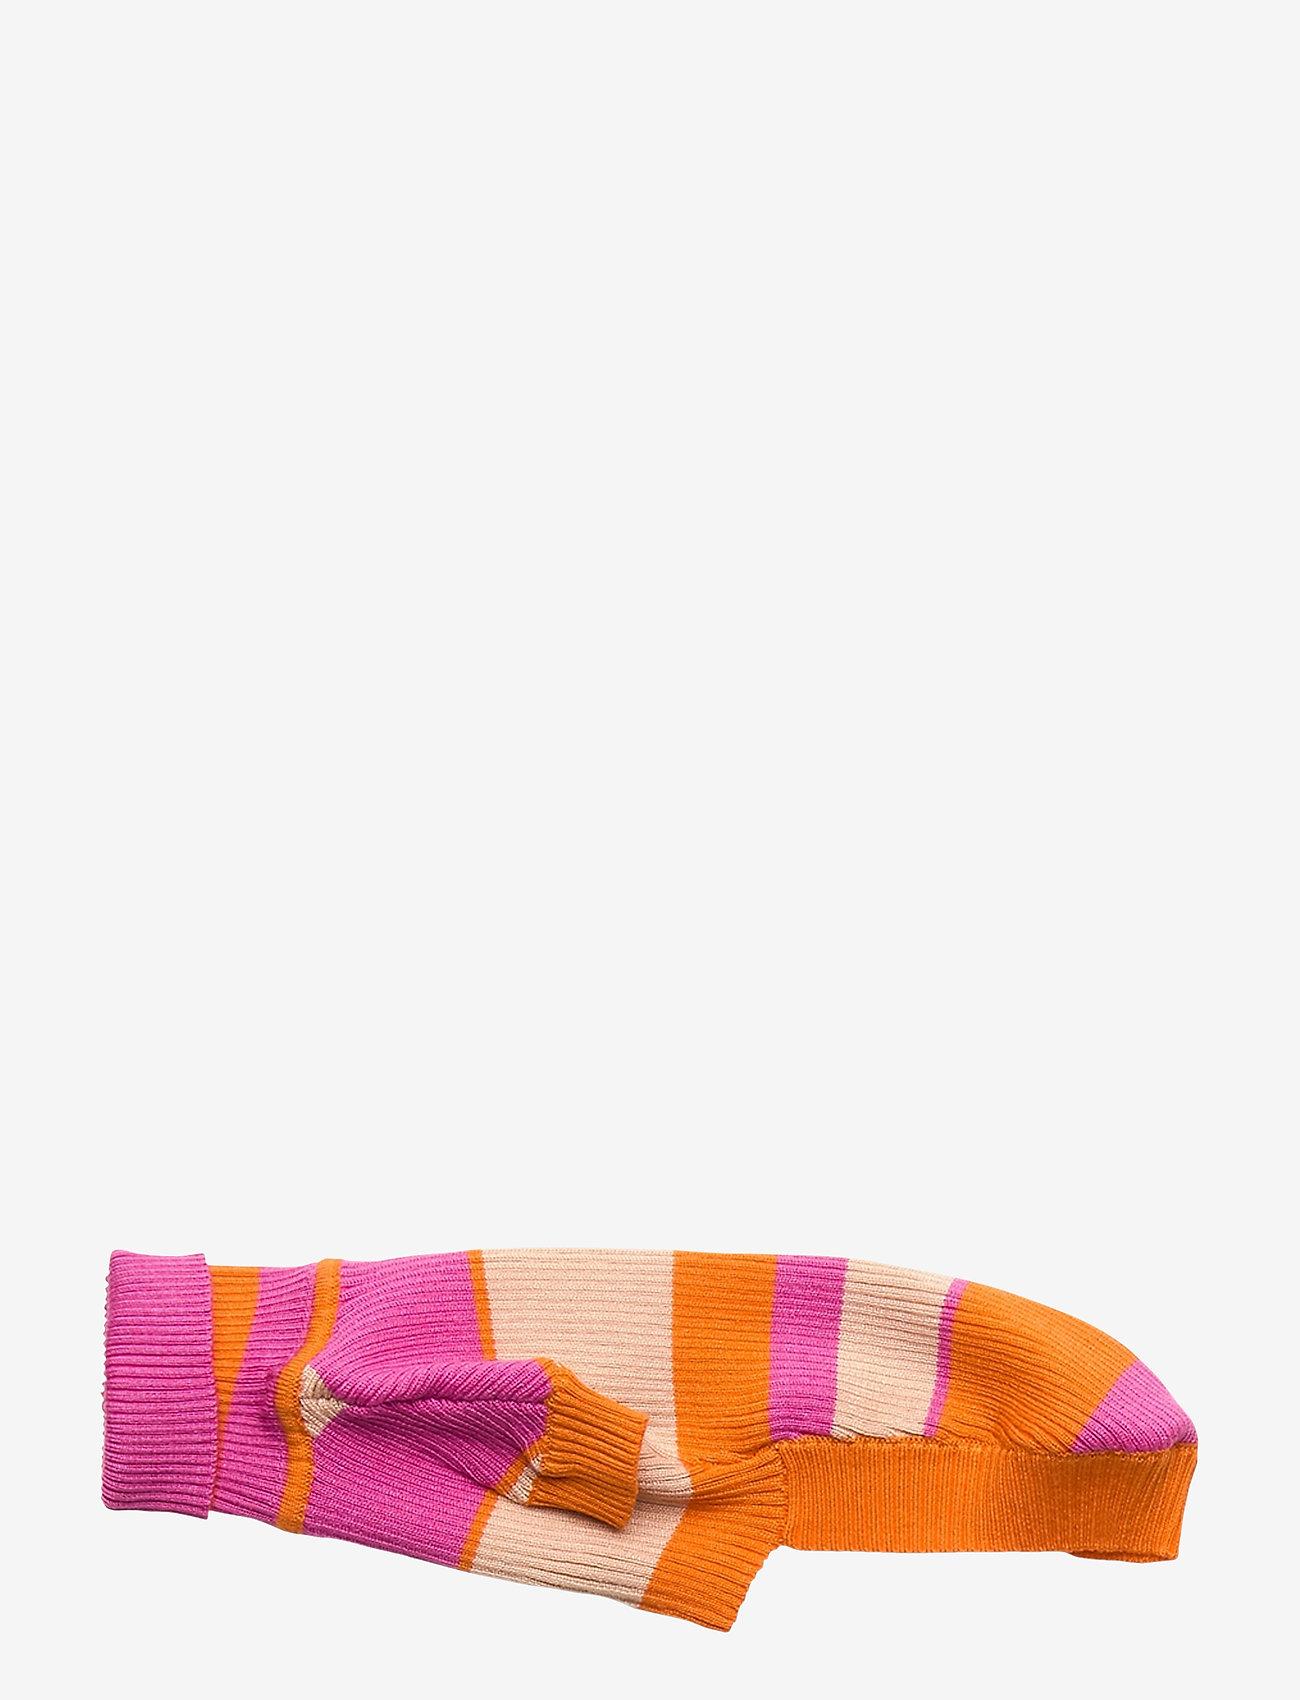 Ilse Jacobsen - Dog Knit - dog accessories - red orange - 1